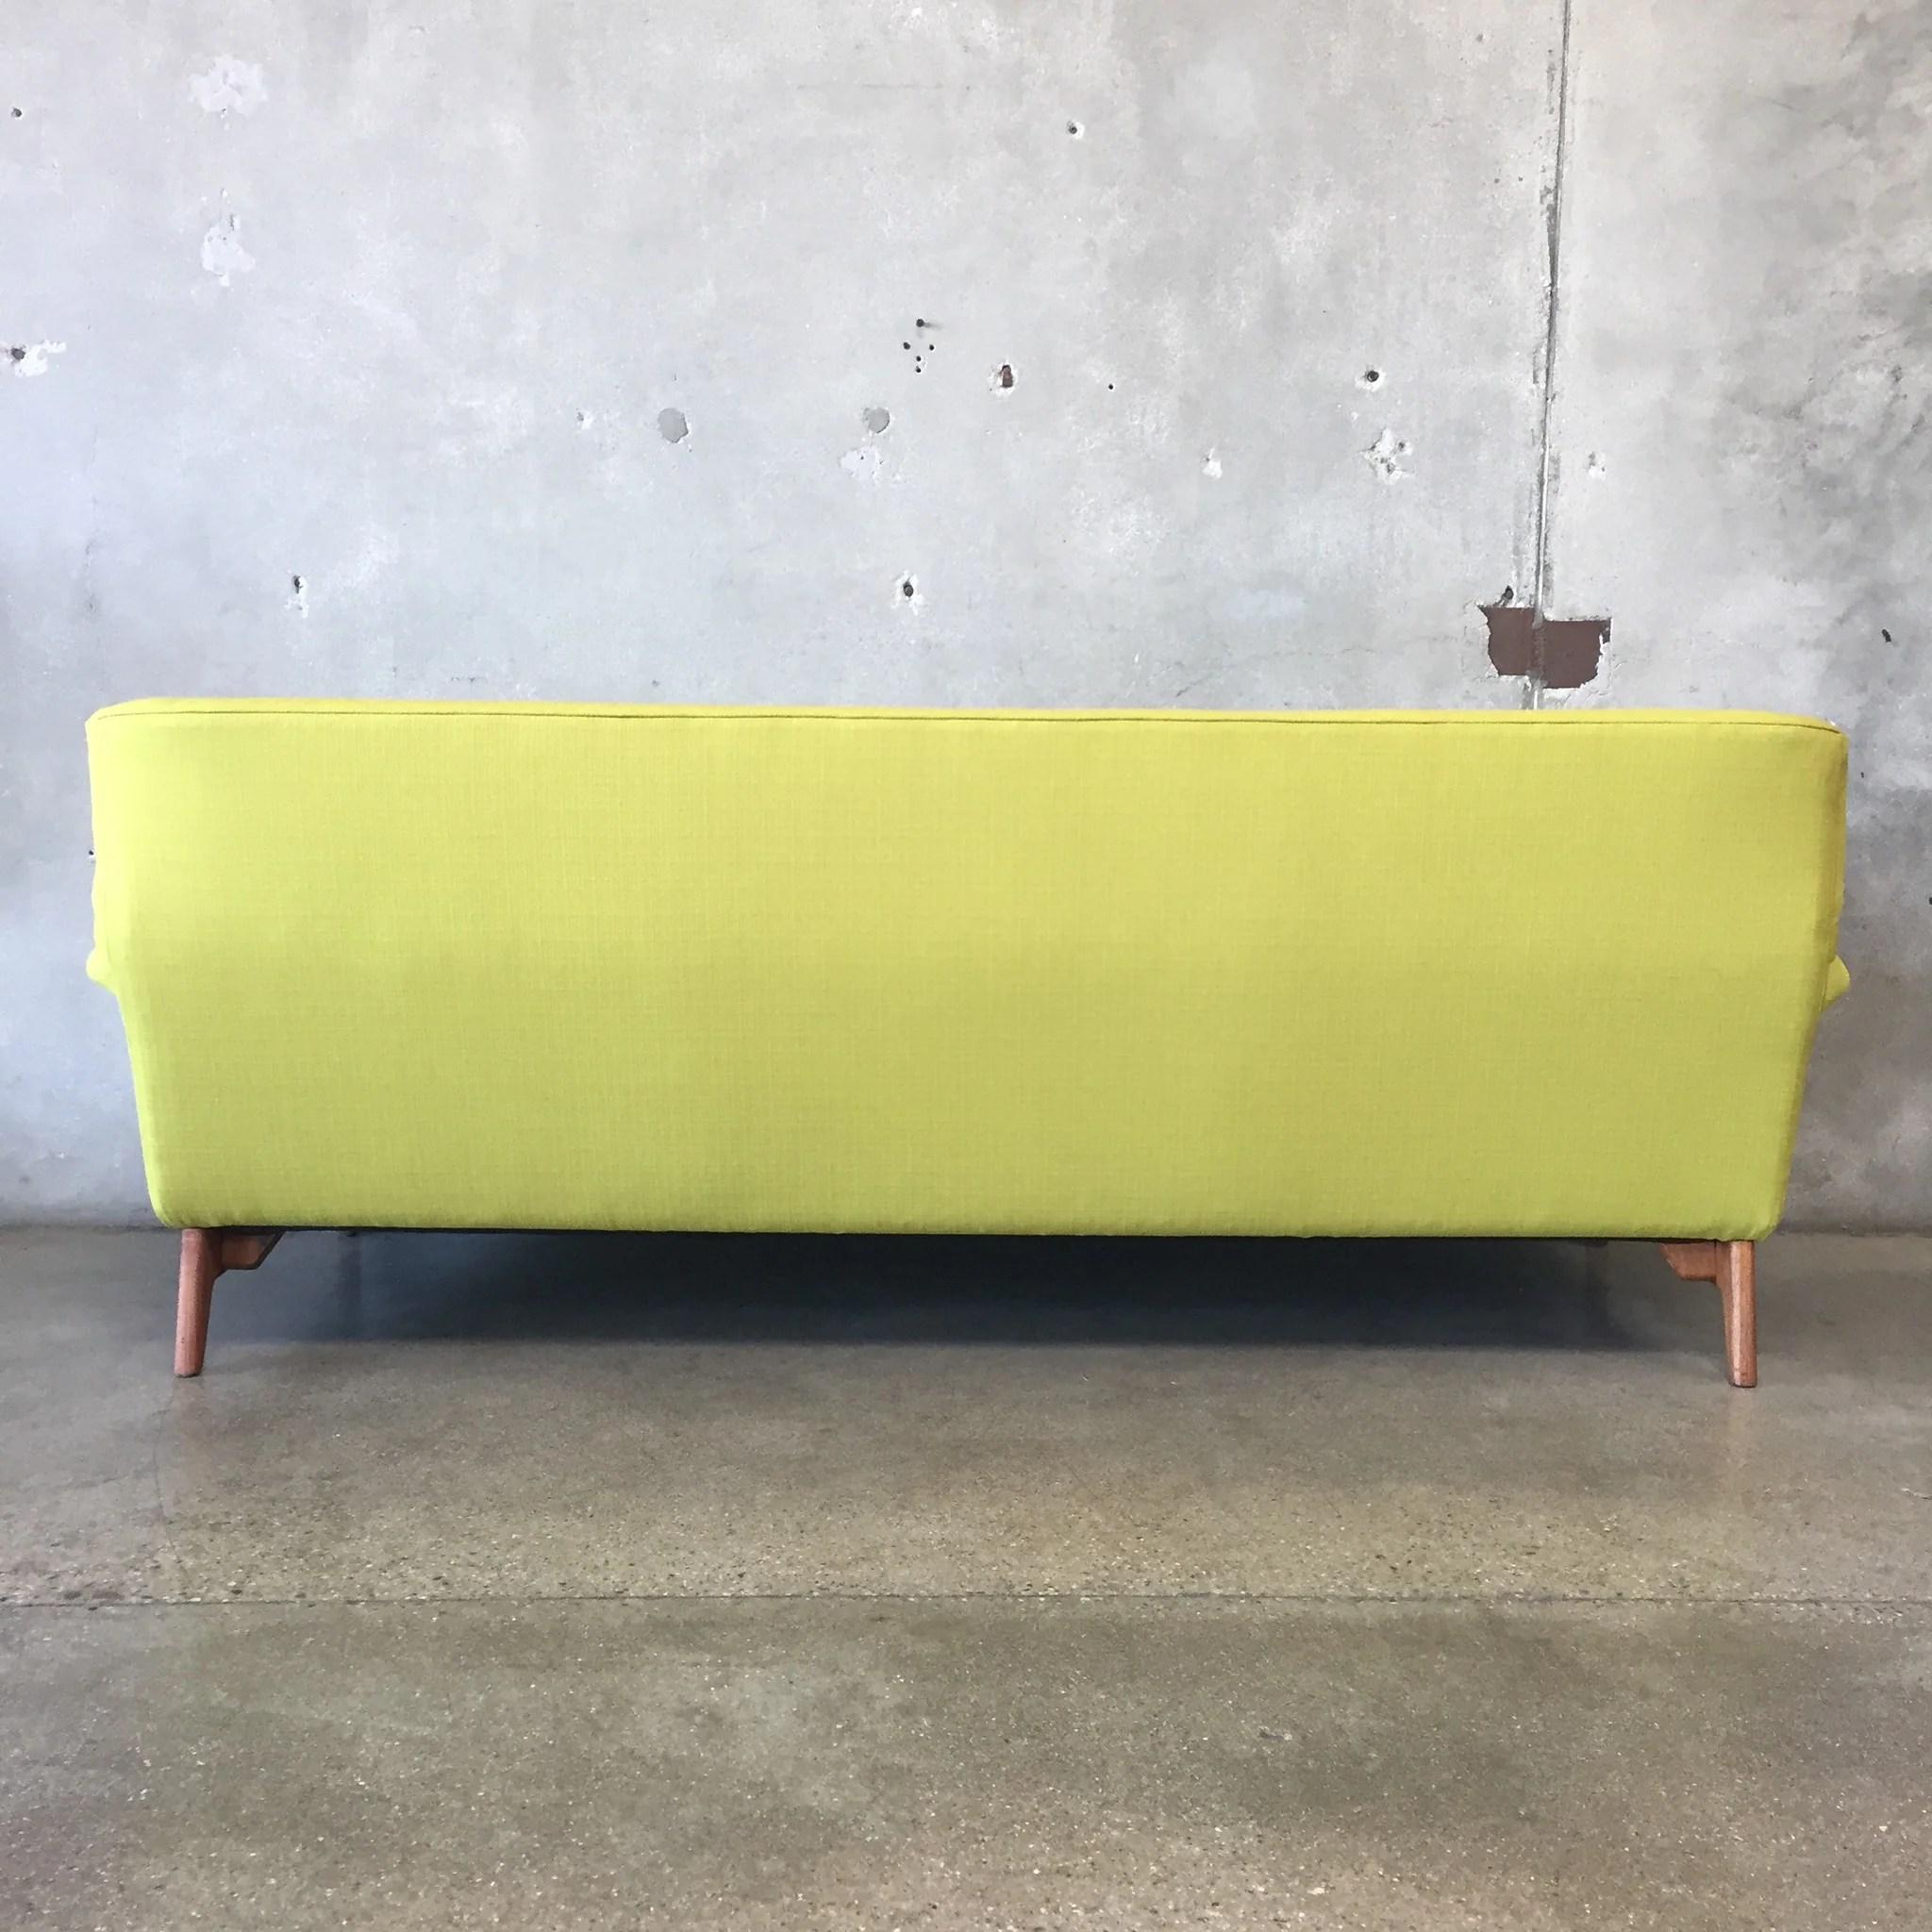 dux sofa by folke ohlsson sofas diseno italiano madrid vintage mid century designed for